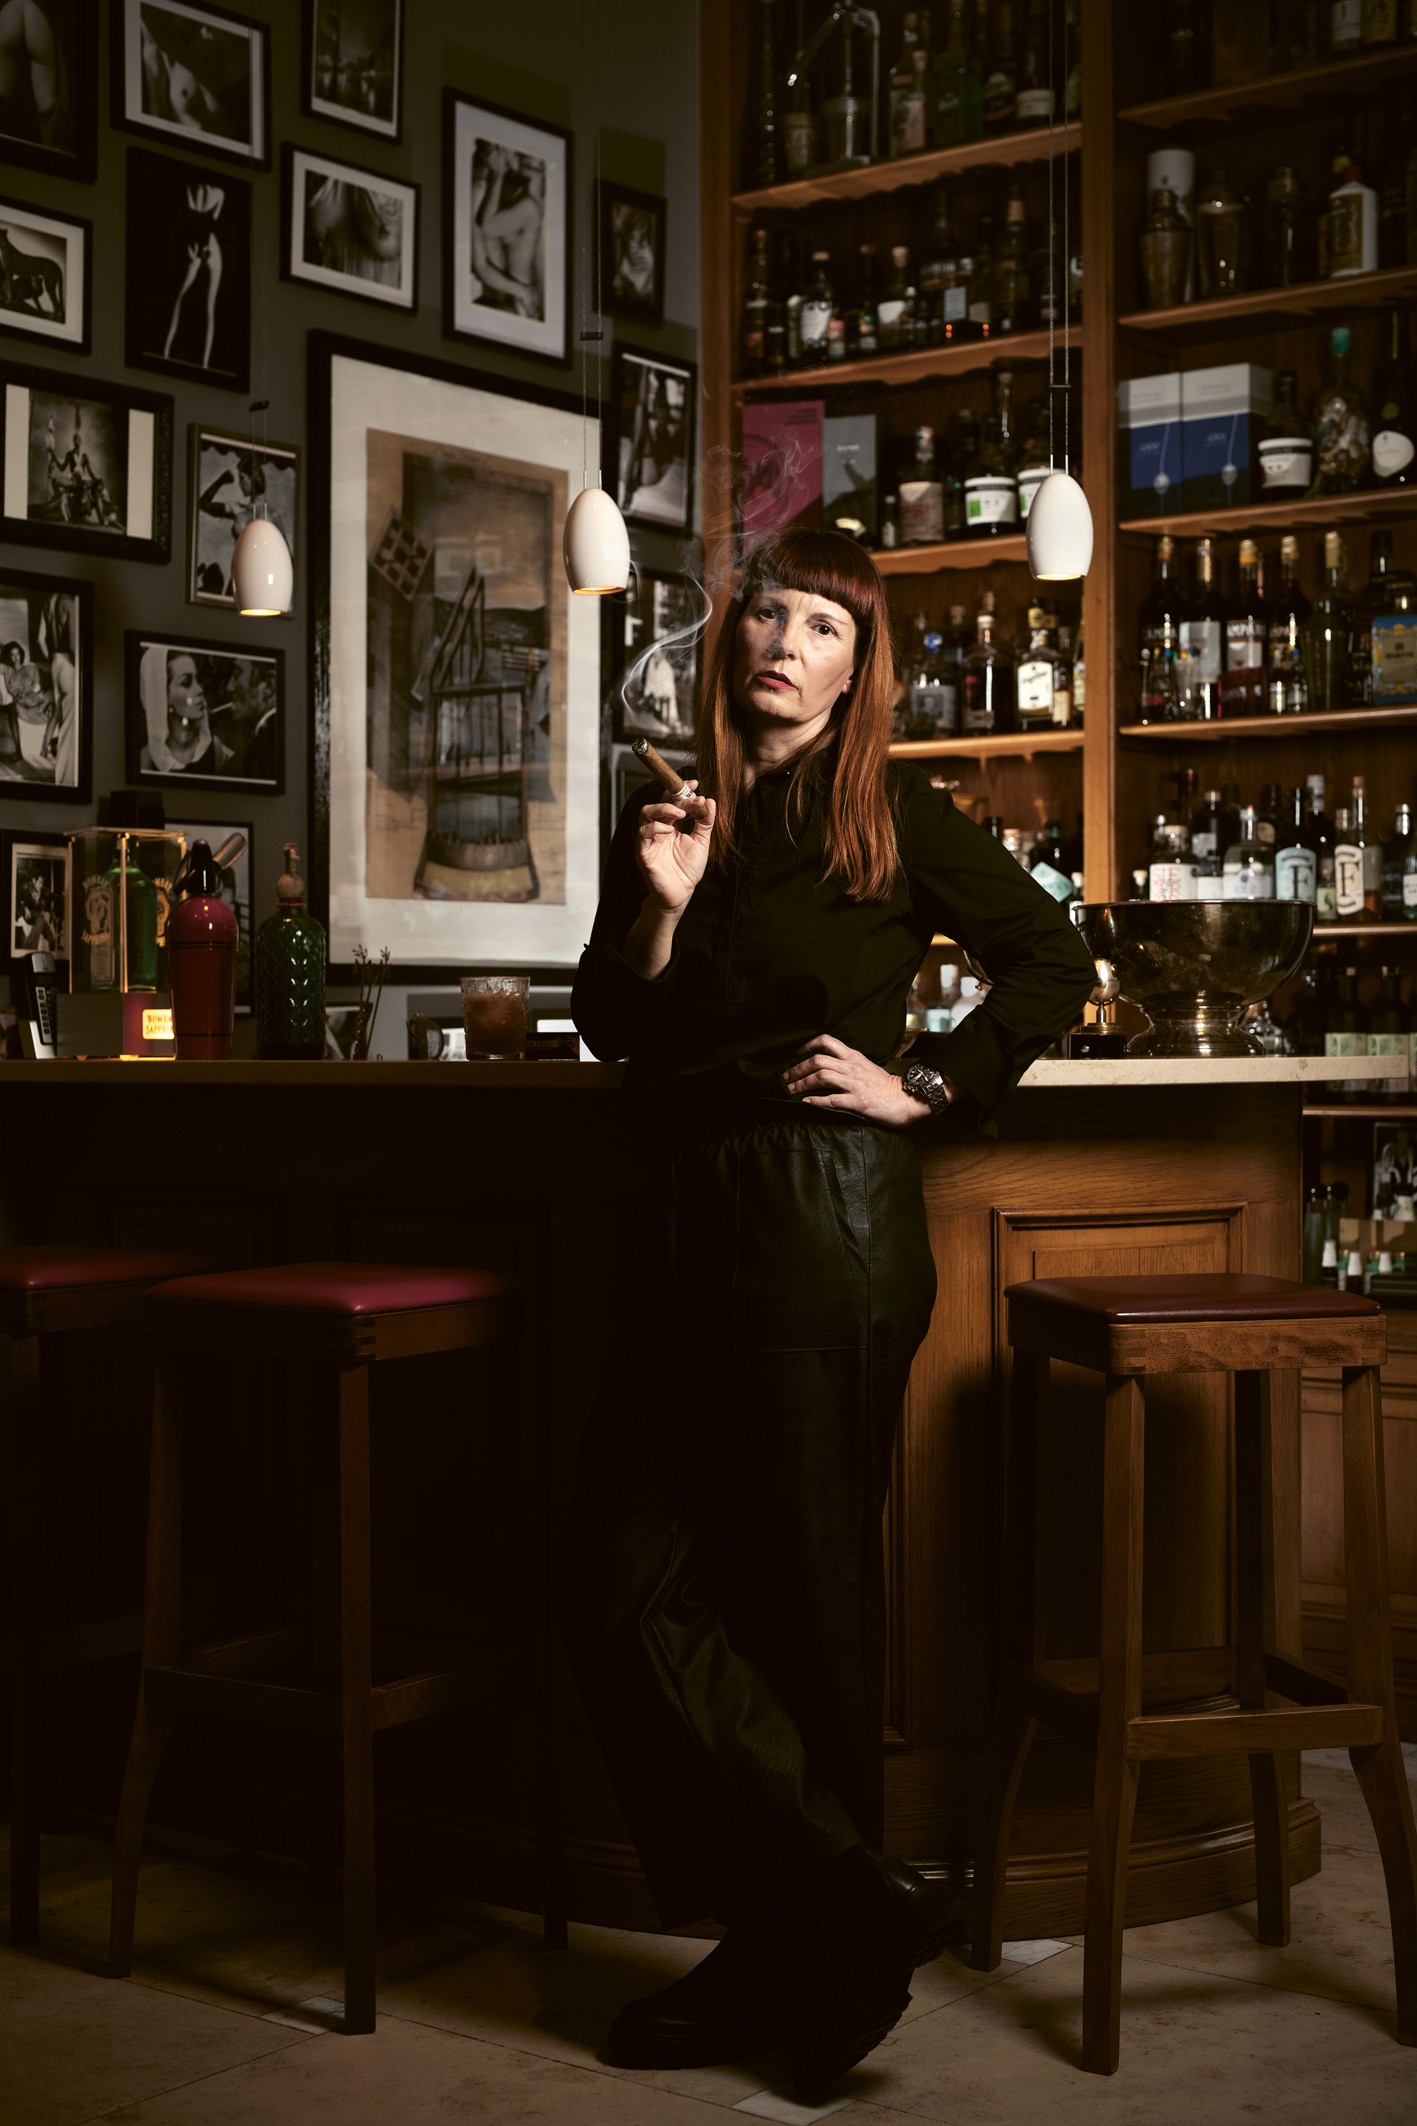 Portrait Maren Meyer, Barkeeperin, Langenhagen, 18.03.2021.